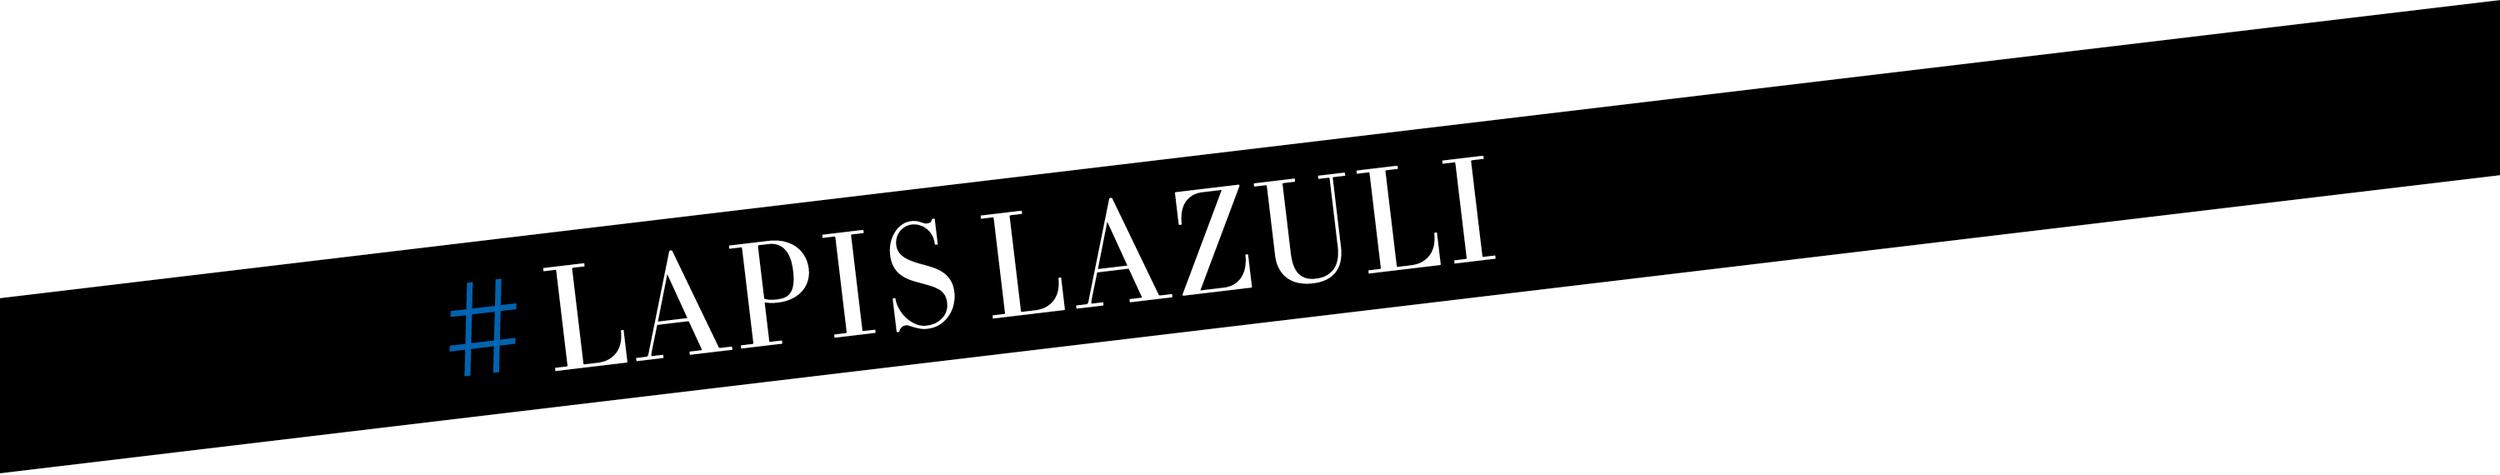 Meet Lapis Lazuli